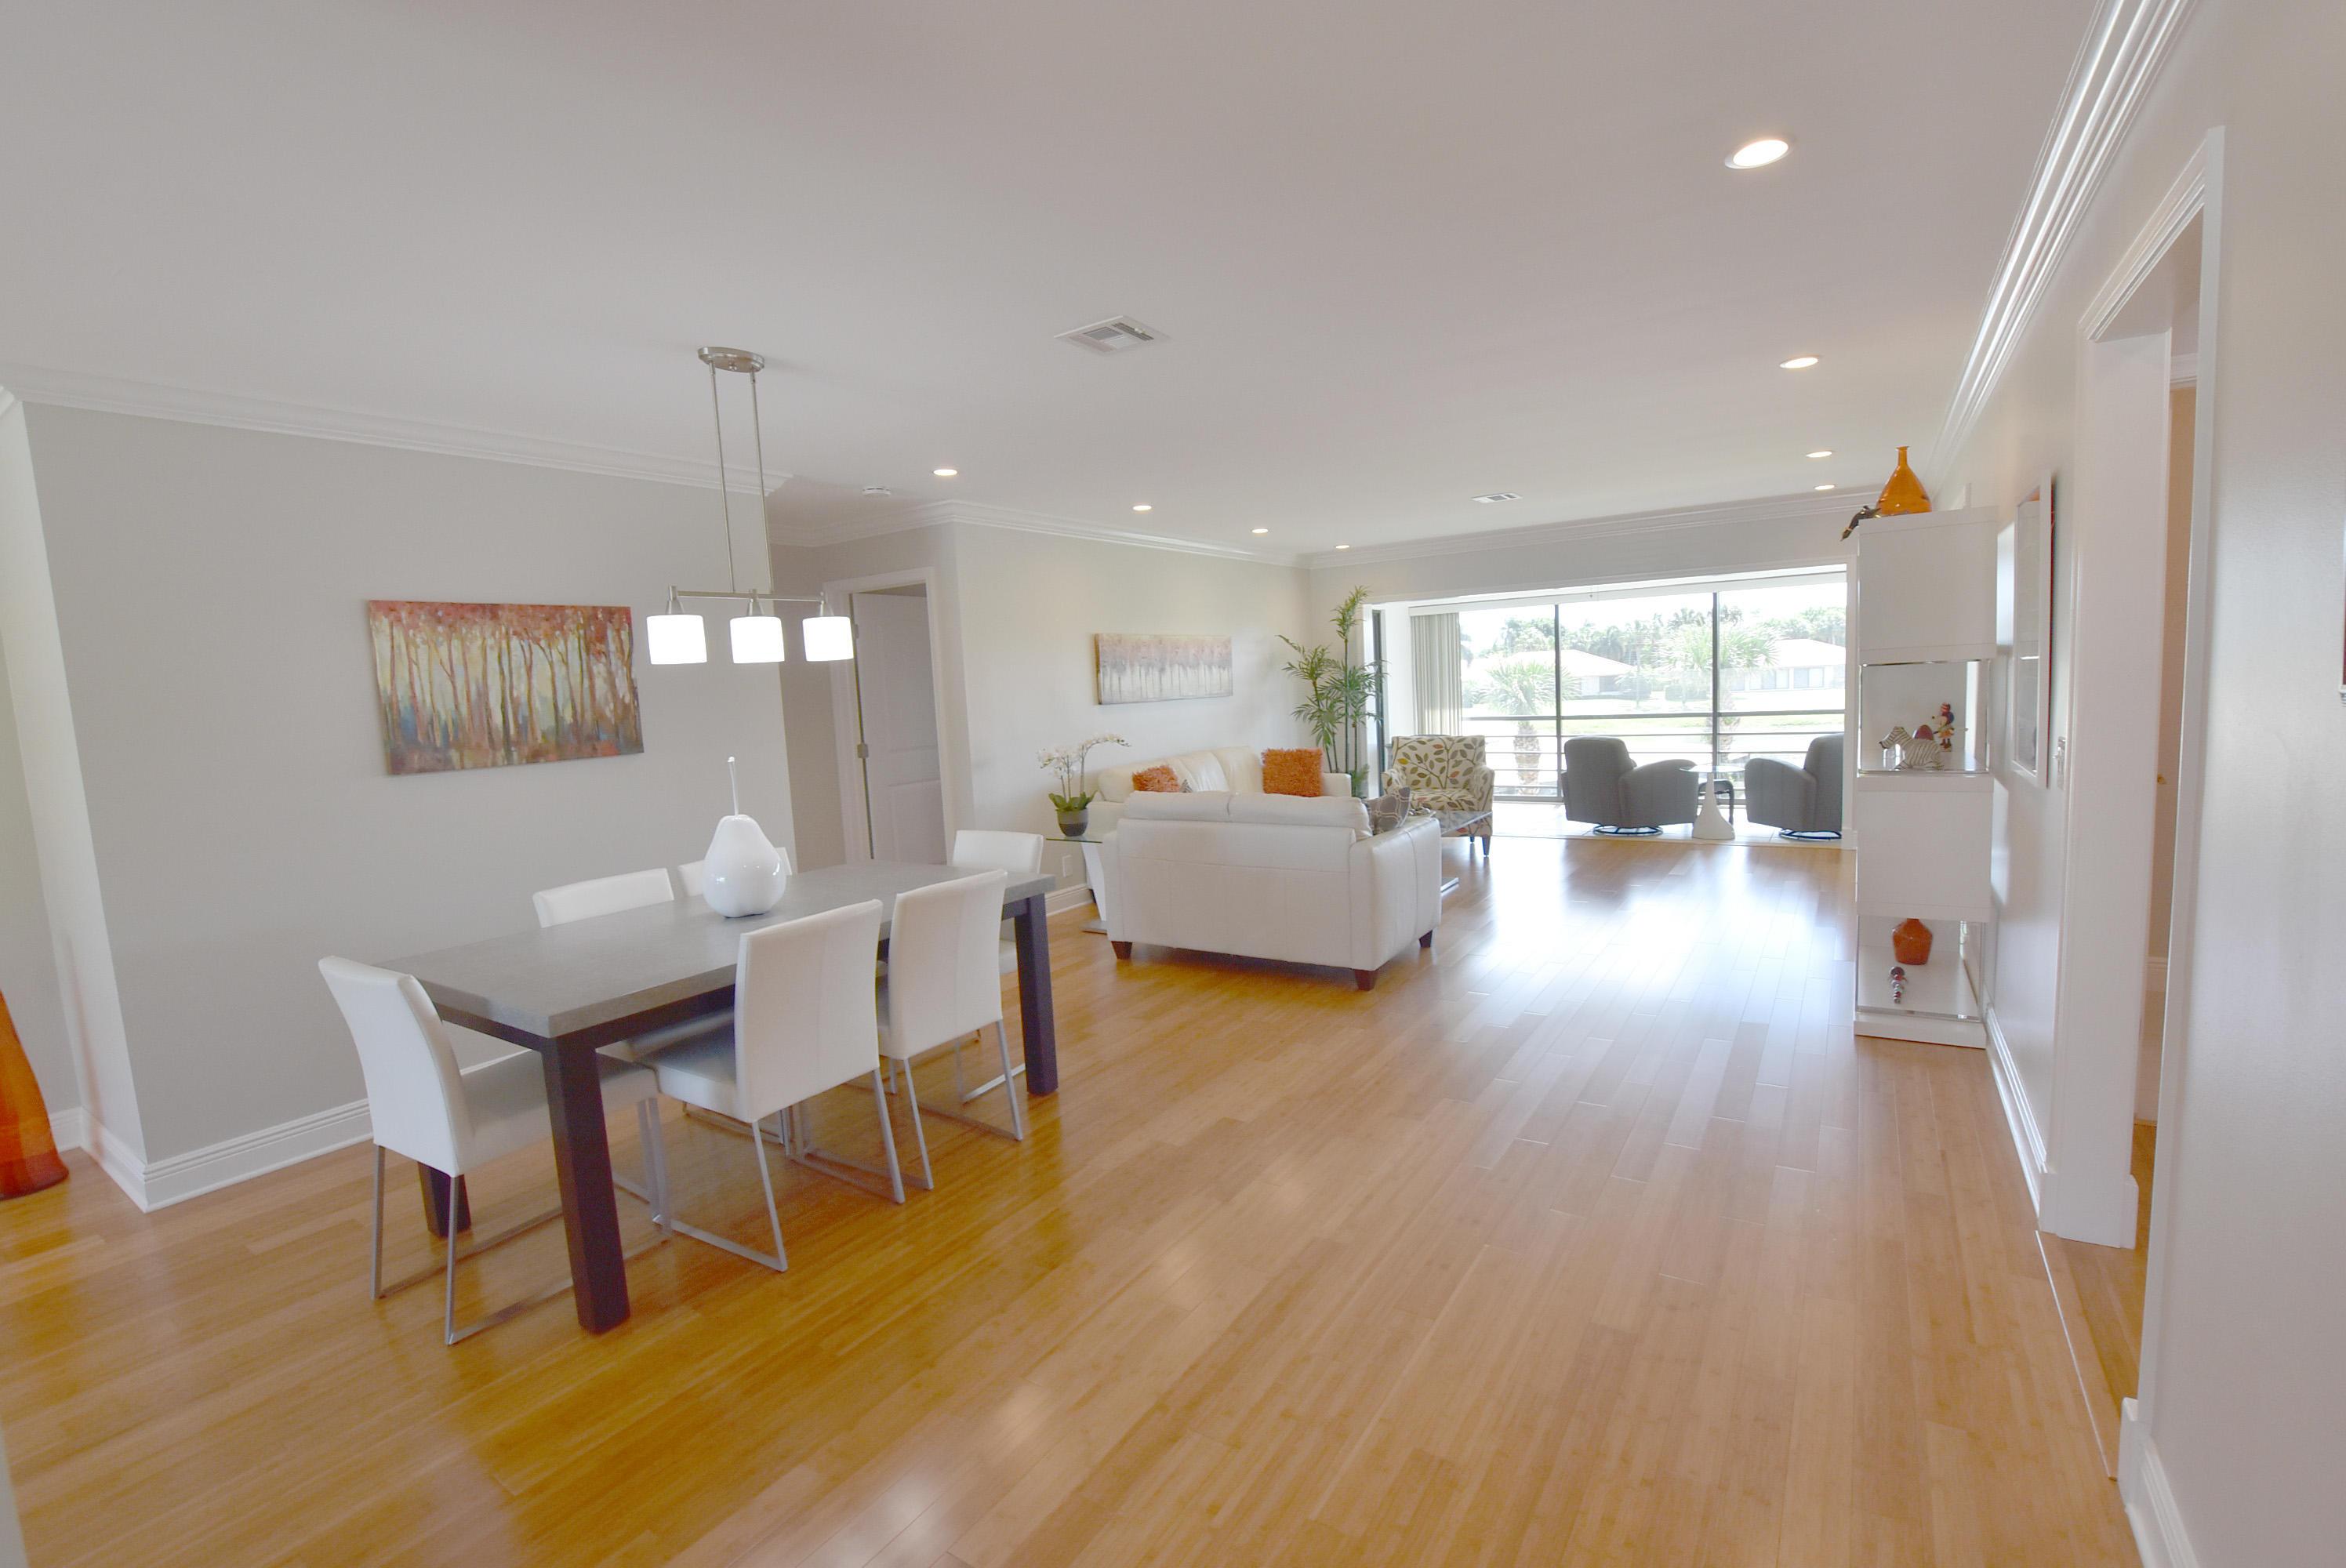 10265 Quail Covey Road Hibiscus S, Boynton Beach, Florida 33436, 3 Bedrooms Bedrooms, ,2 BathroomsBathrooms,A,Condominium,Quail Covey,RX-10609766